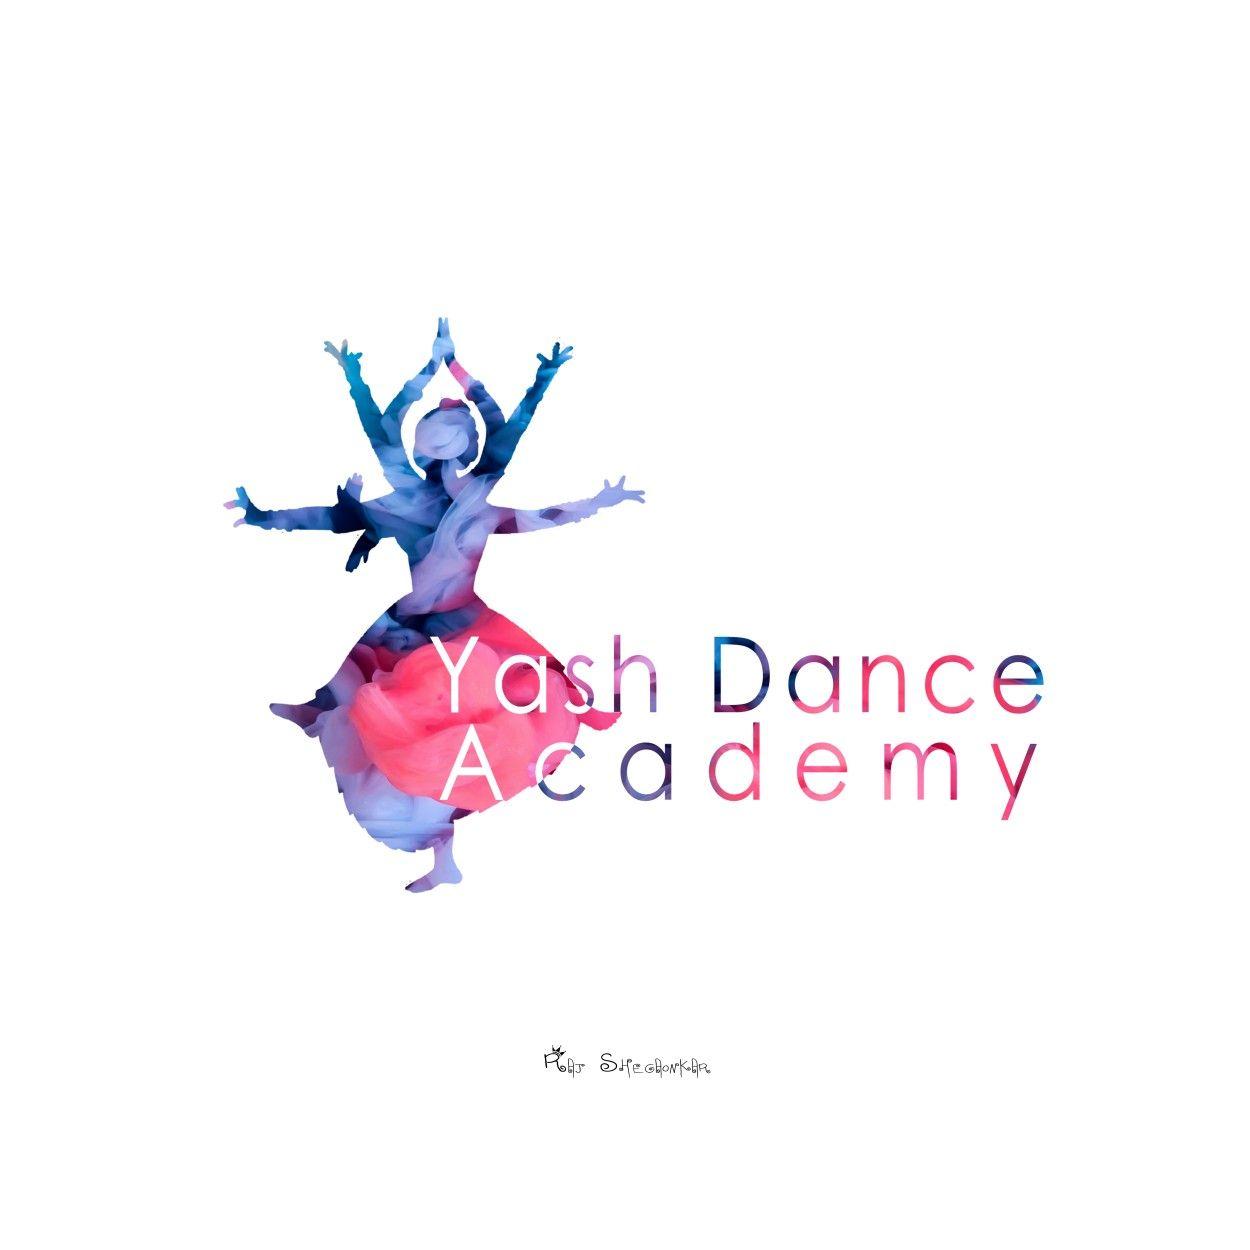 A Classic Logo Design for Yash Dance Academy ...